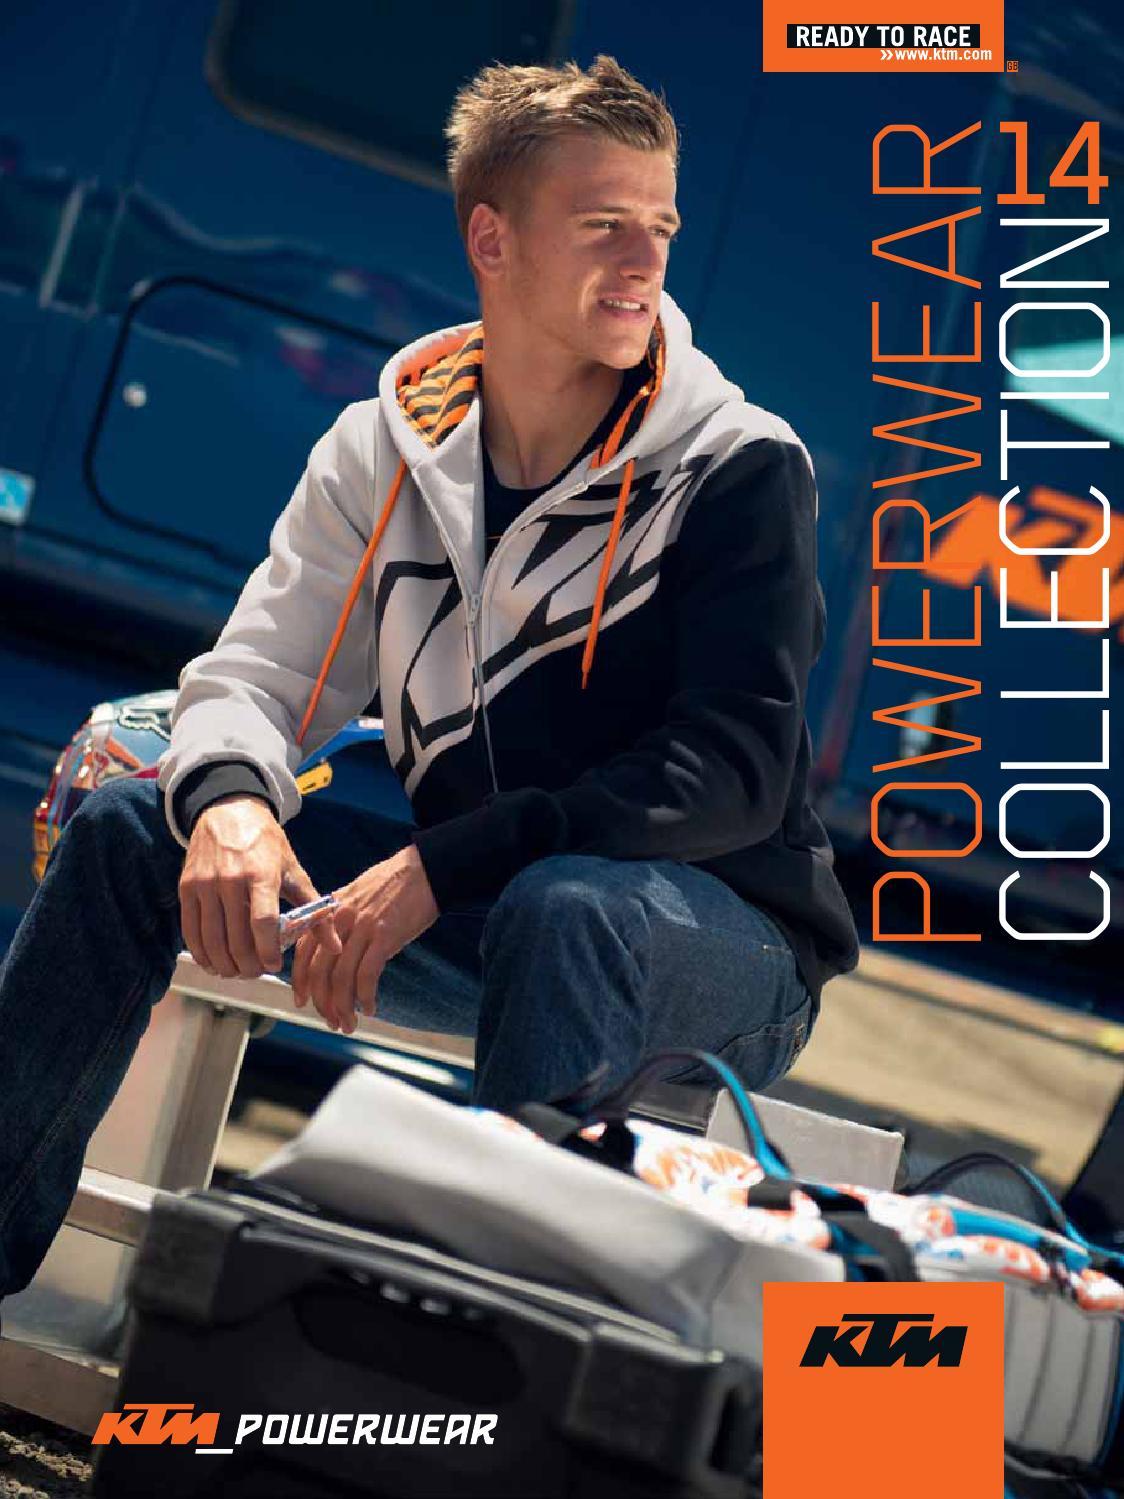 KTM PowerWear Catalogue 2014 English by KTM GROUP issuu